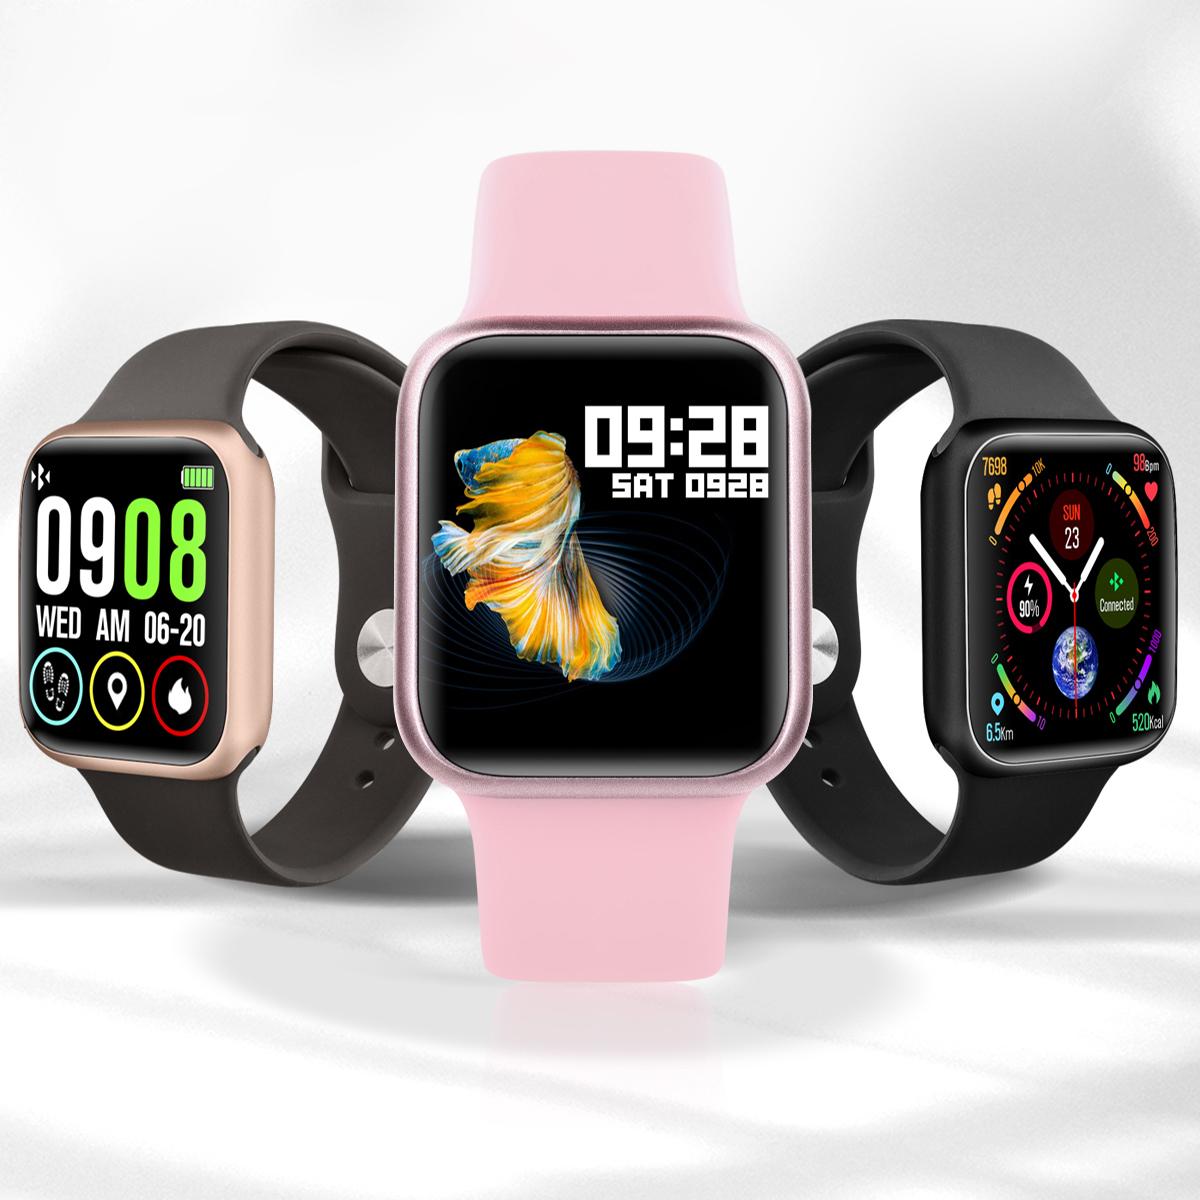 P90 Smart Watch 38mm Full Touch Fitness Tracker IP68 Waterproof Wireless Charging Sports Smartwatch PK Apple Watch P68 P70 Pro